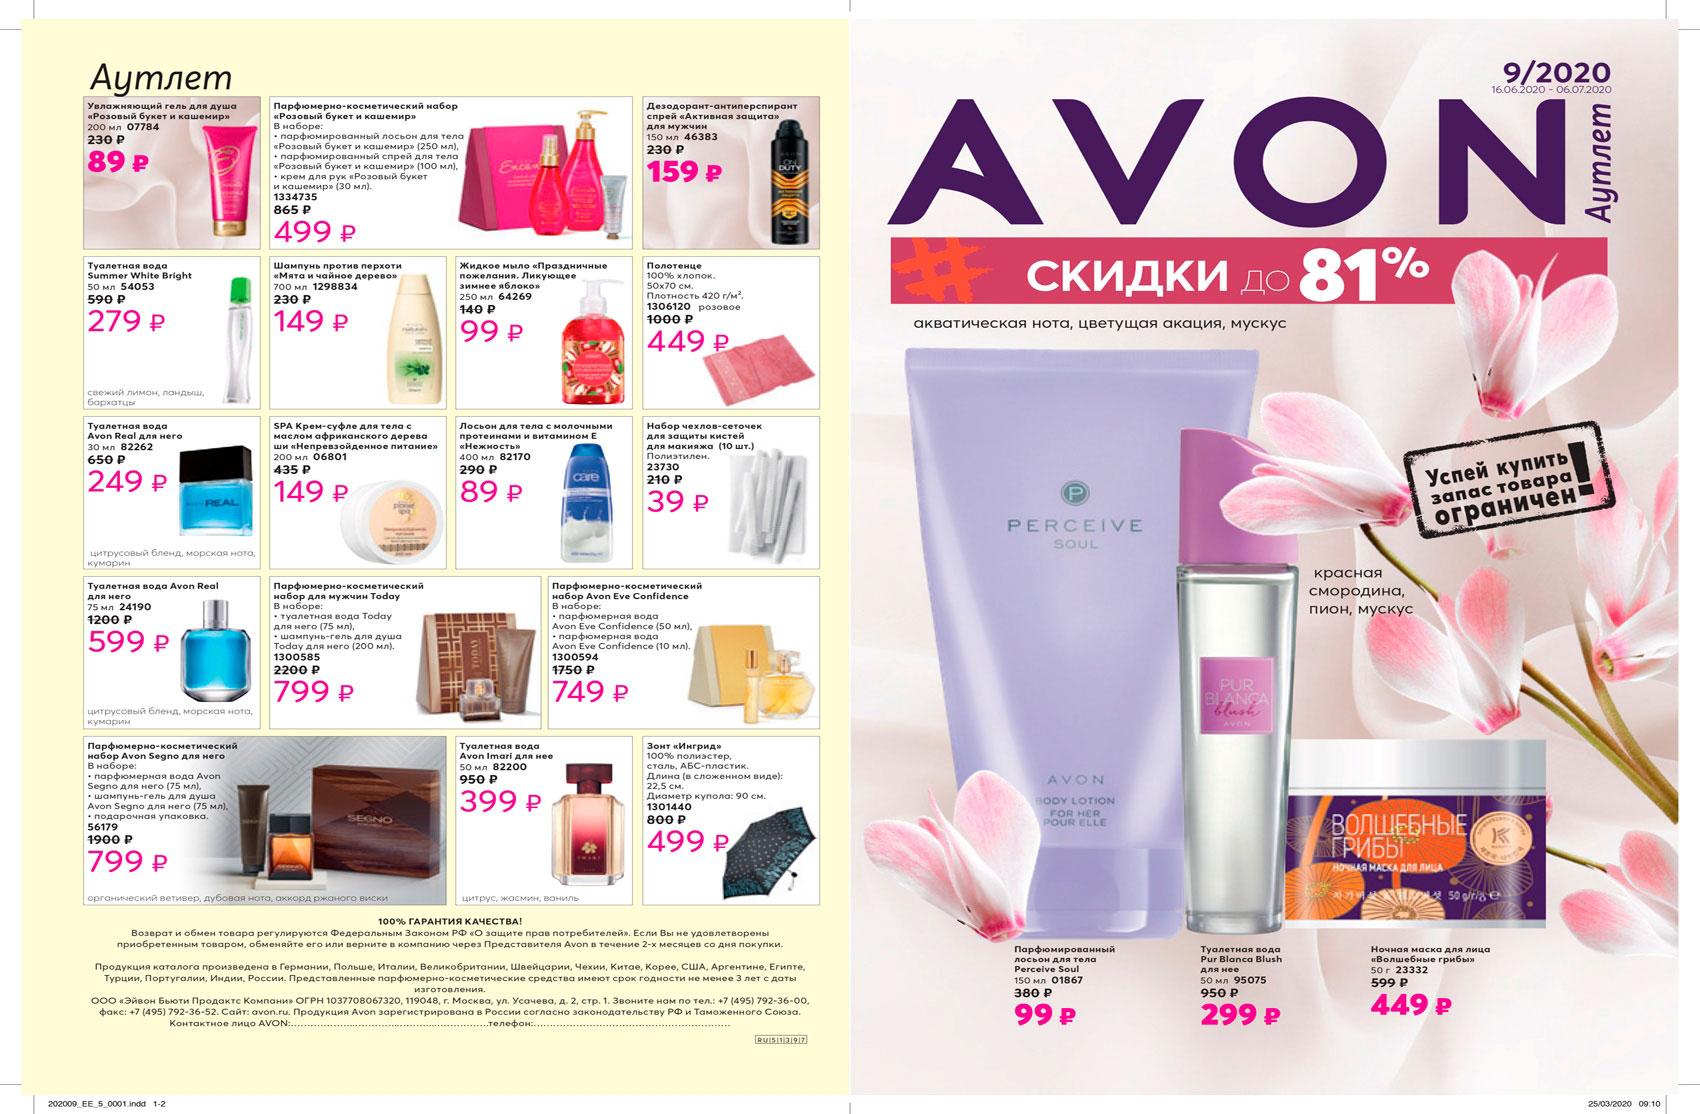 My avon magazin арбутин для косметики купить